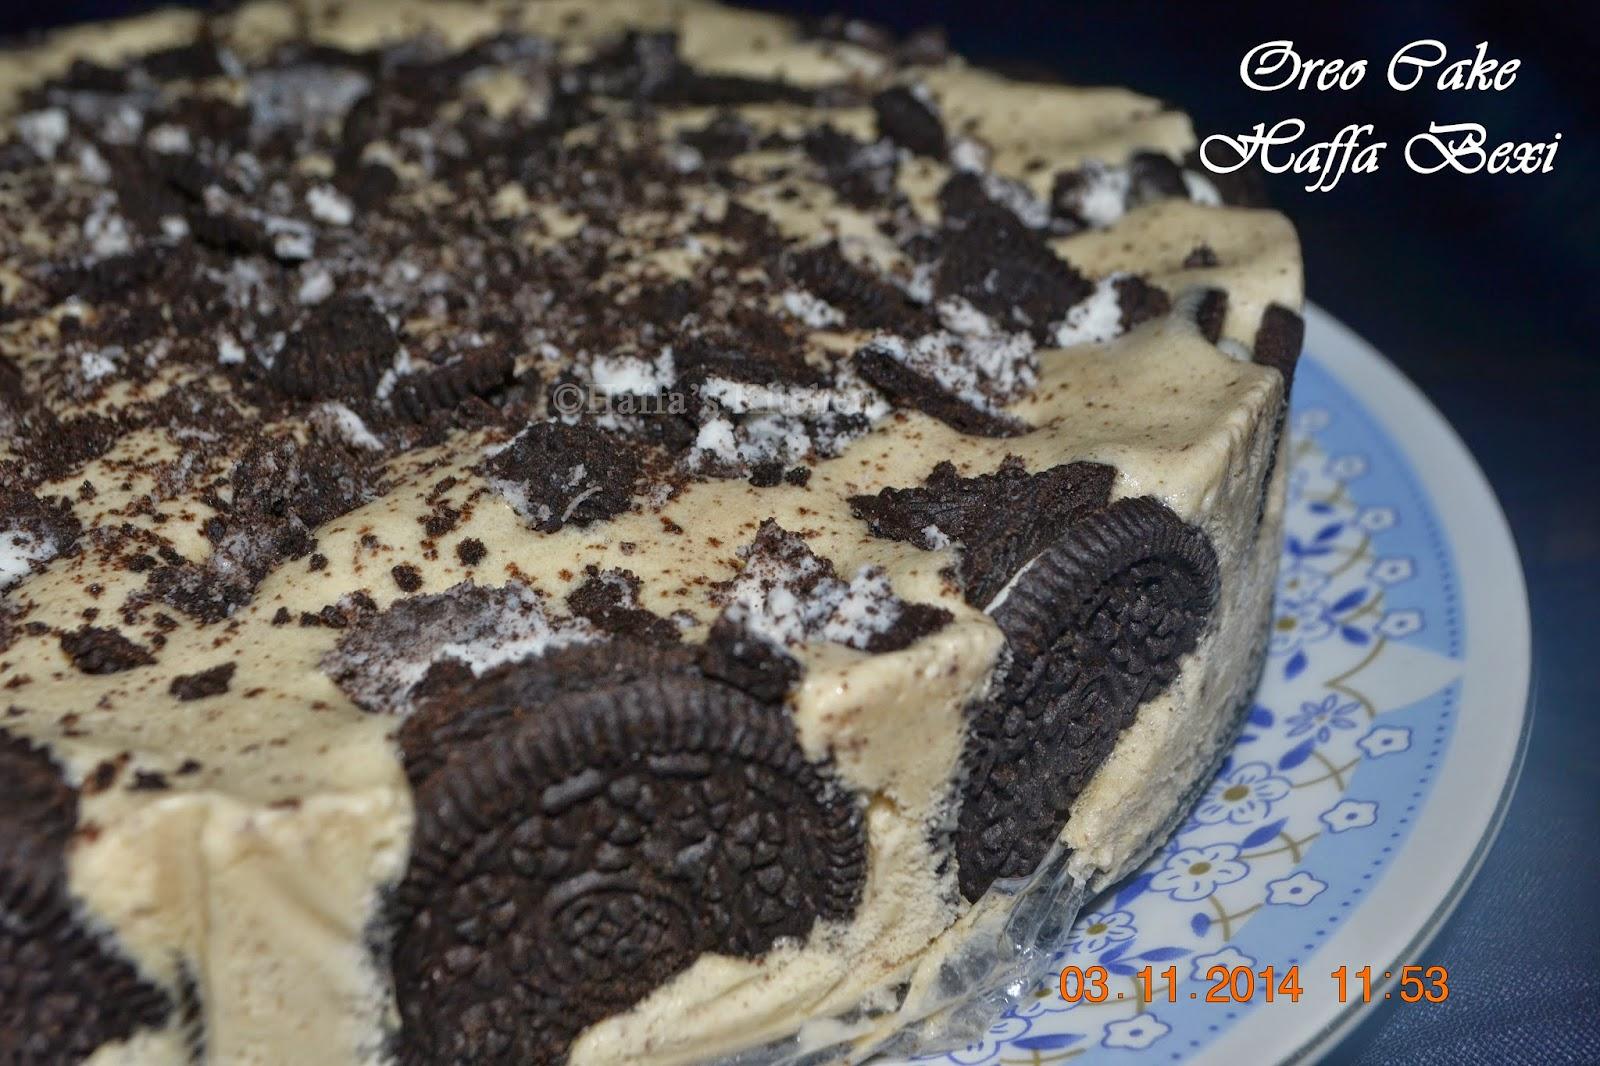 Oreo ice cream cake wedding anniversary special haffa's kitchen